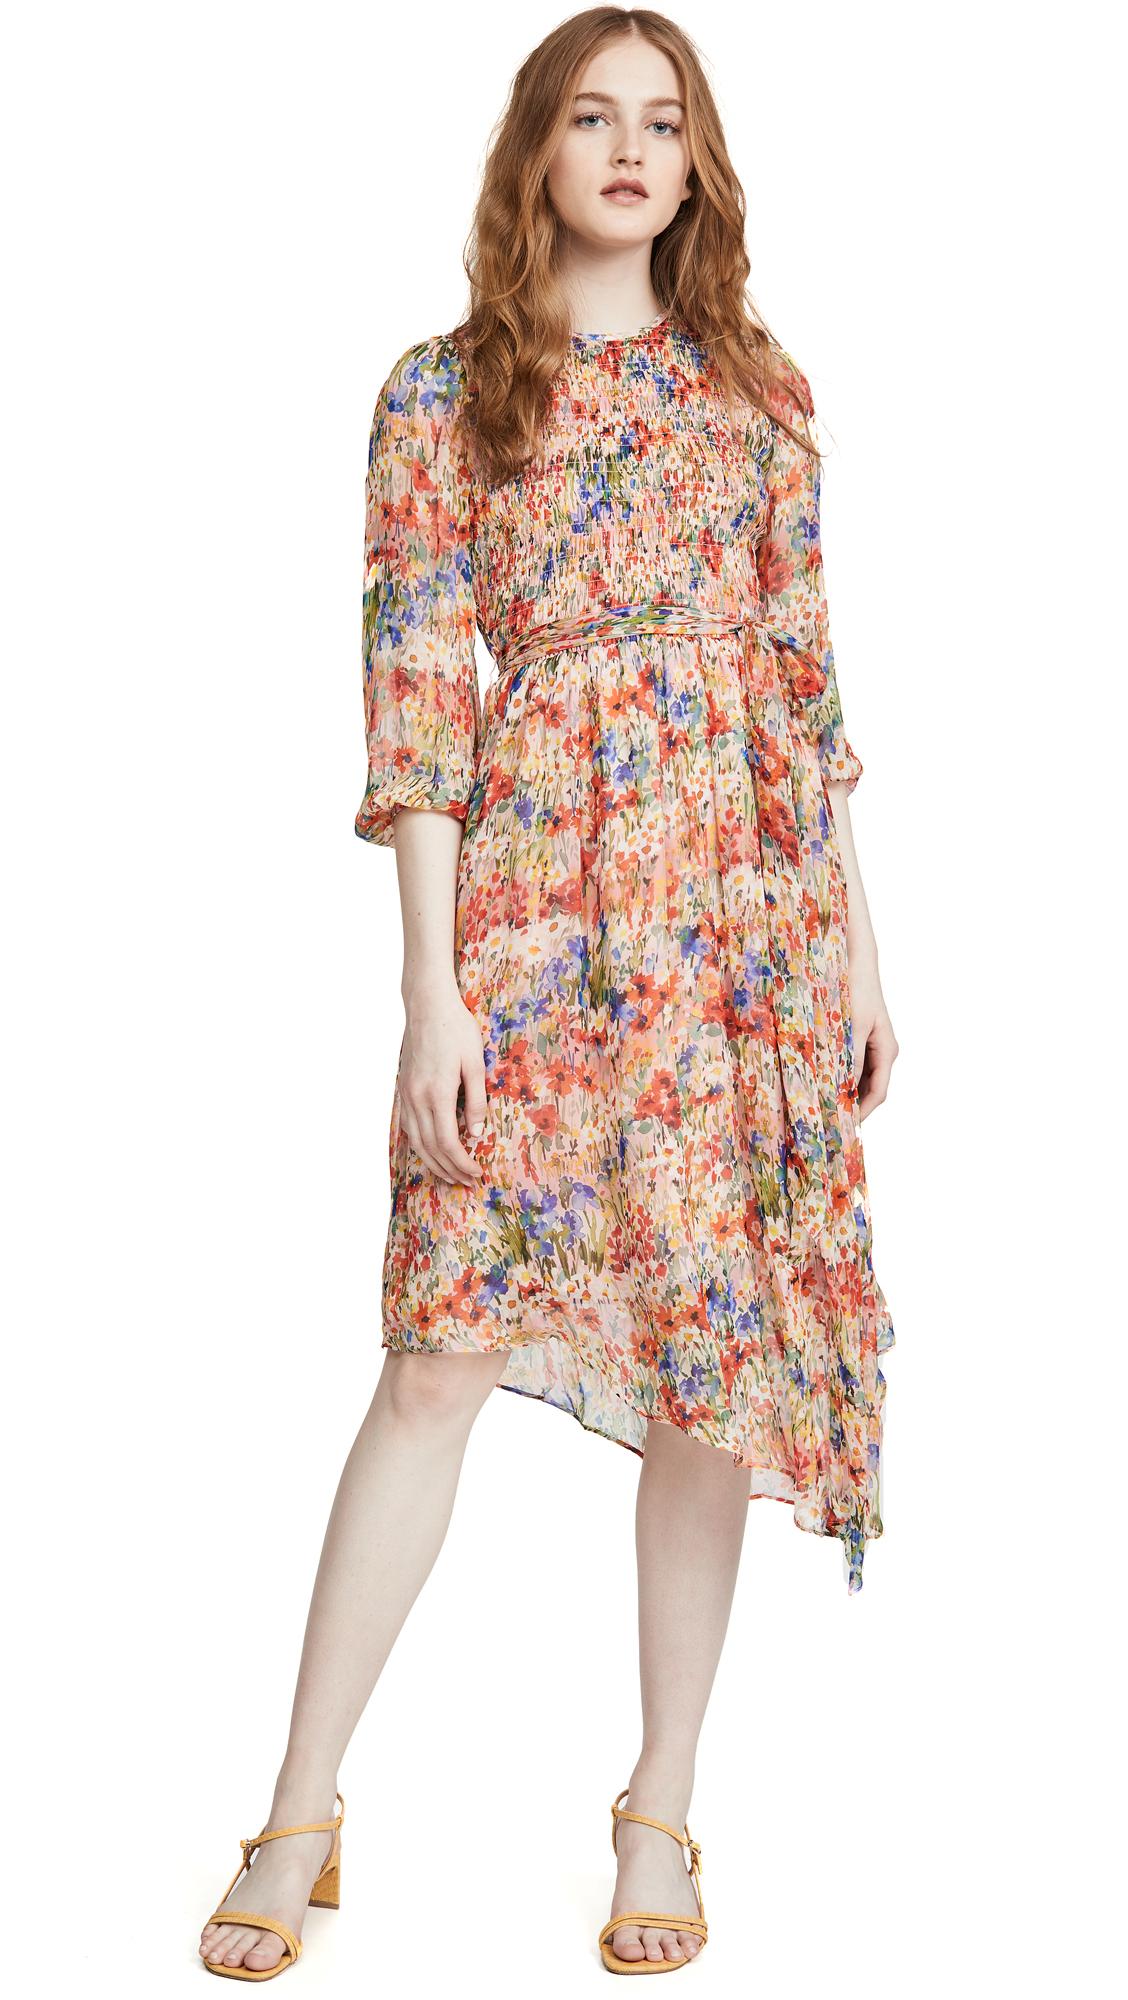 Shoshanna Beatriz Dress - 40% Off Sale